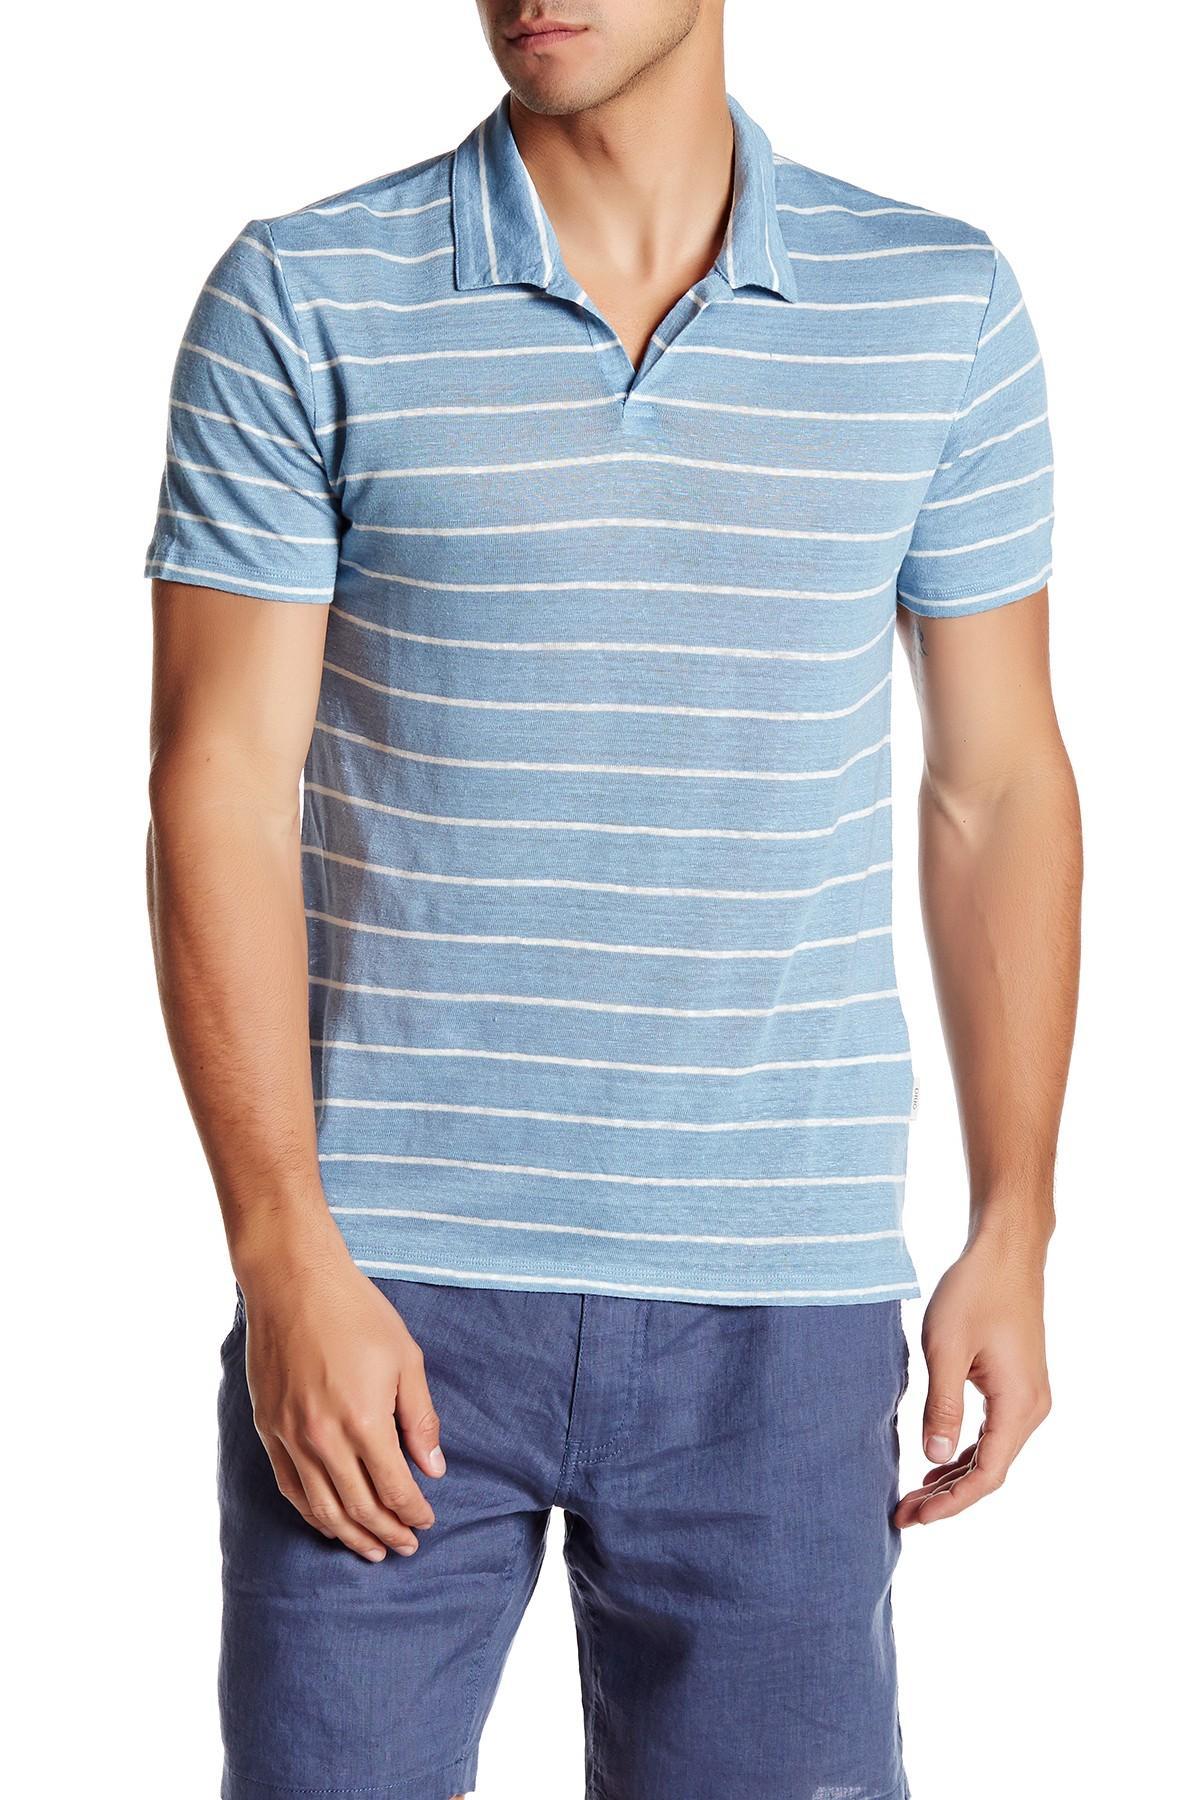 Onia Shaun Stripe Linen Polo In Blue For Men Lyst